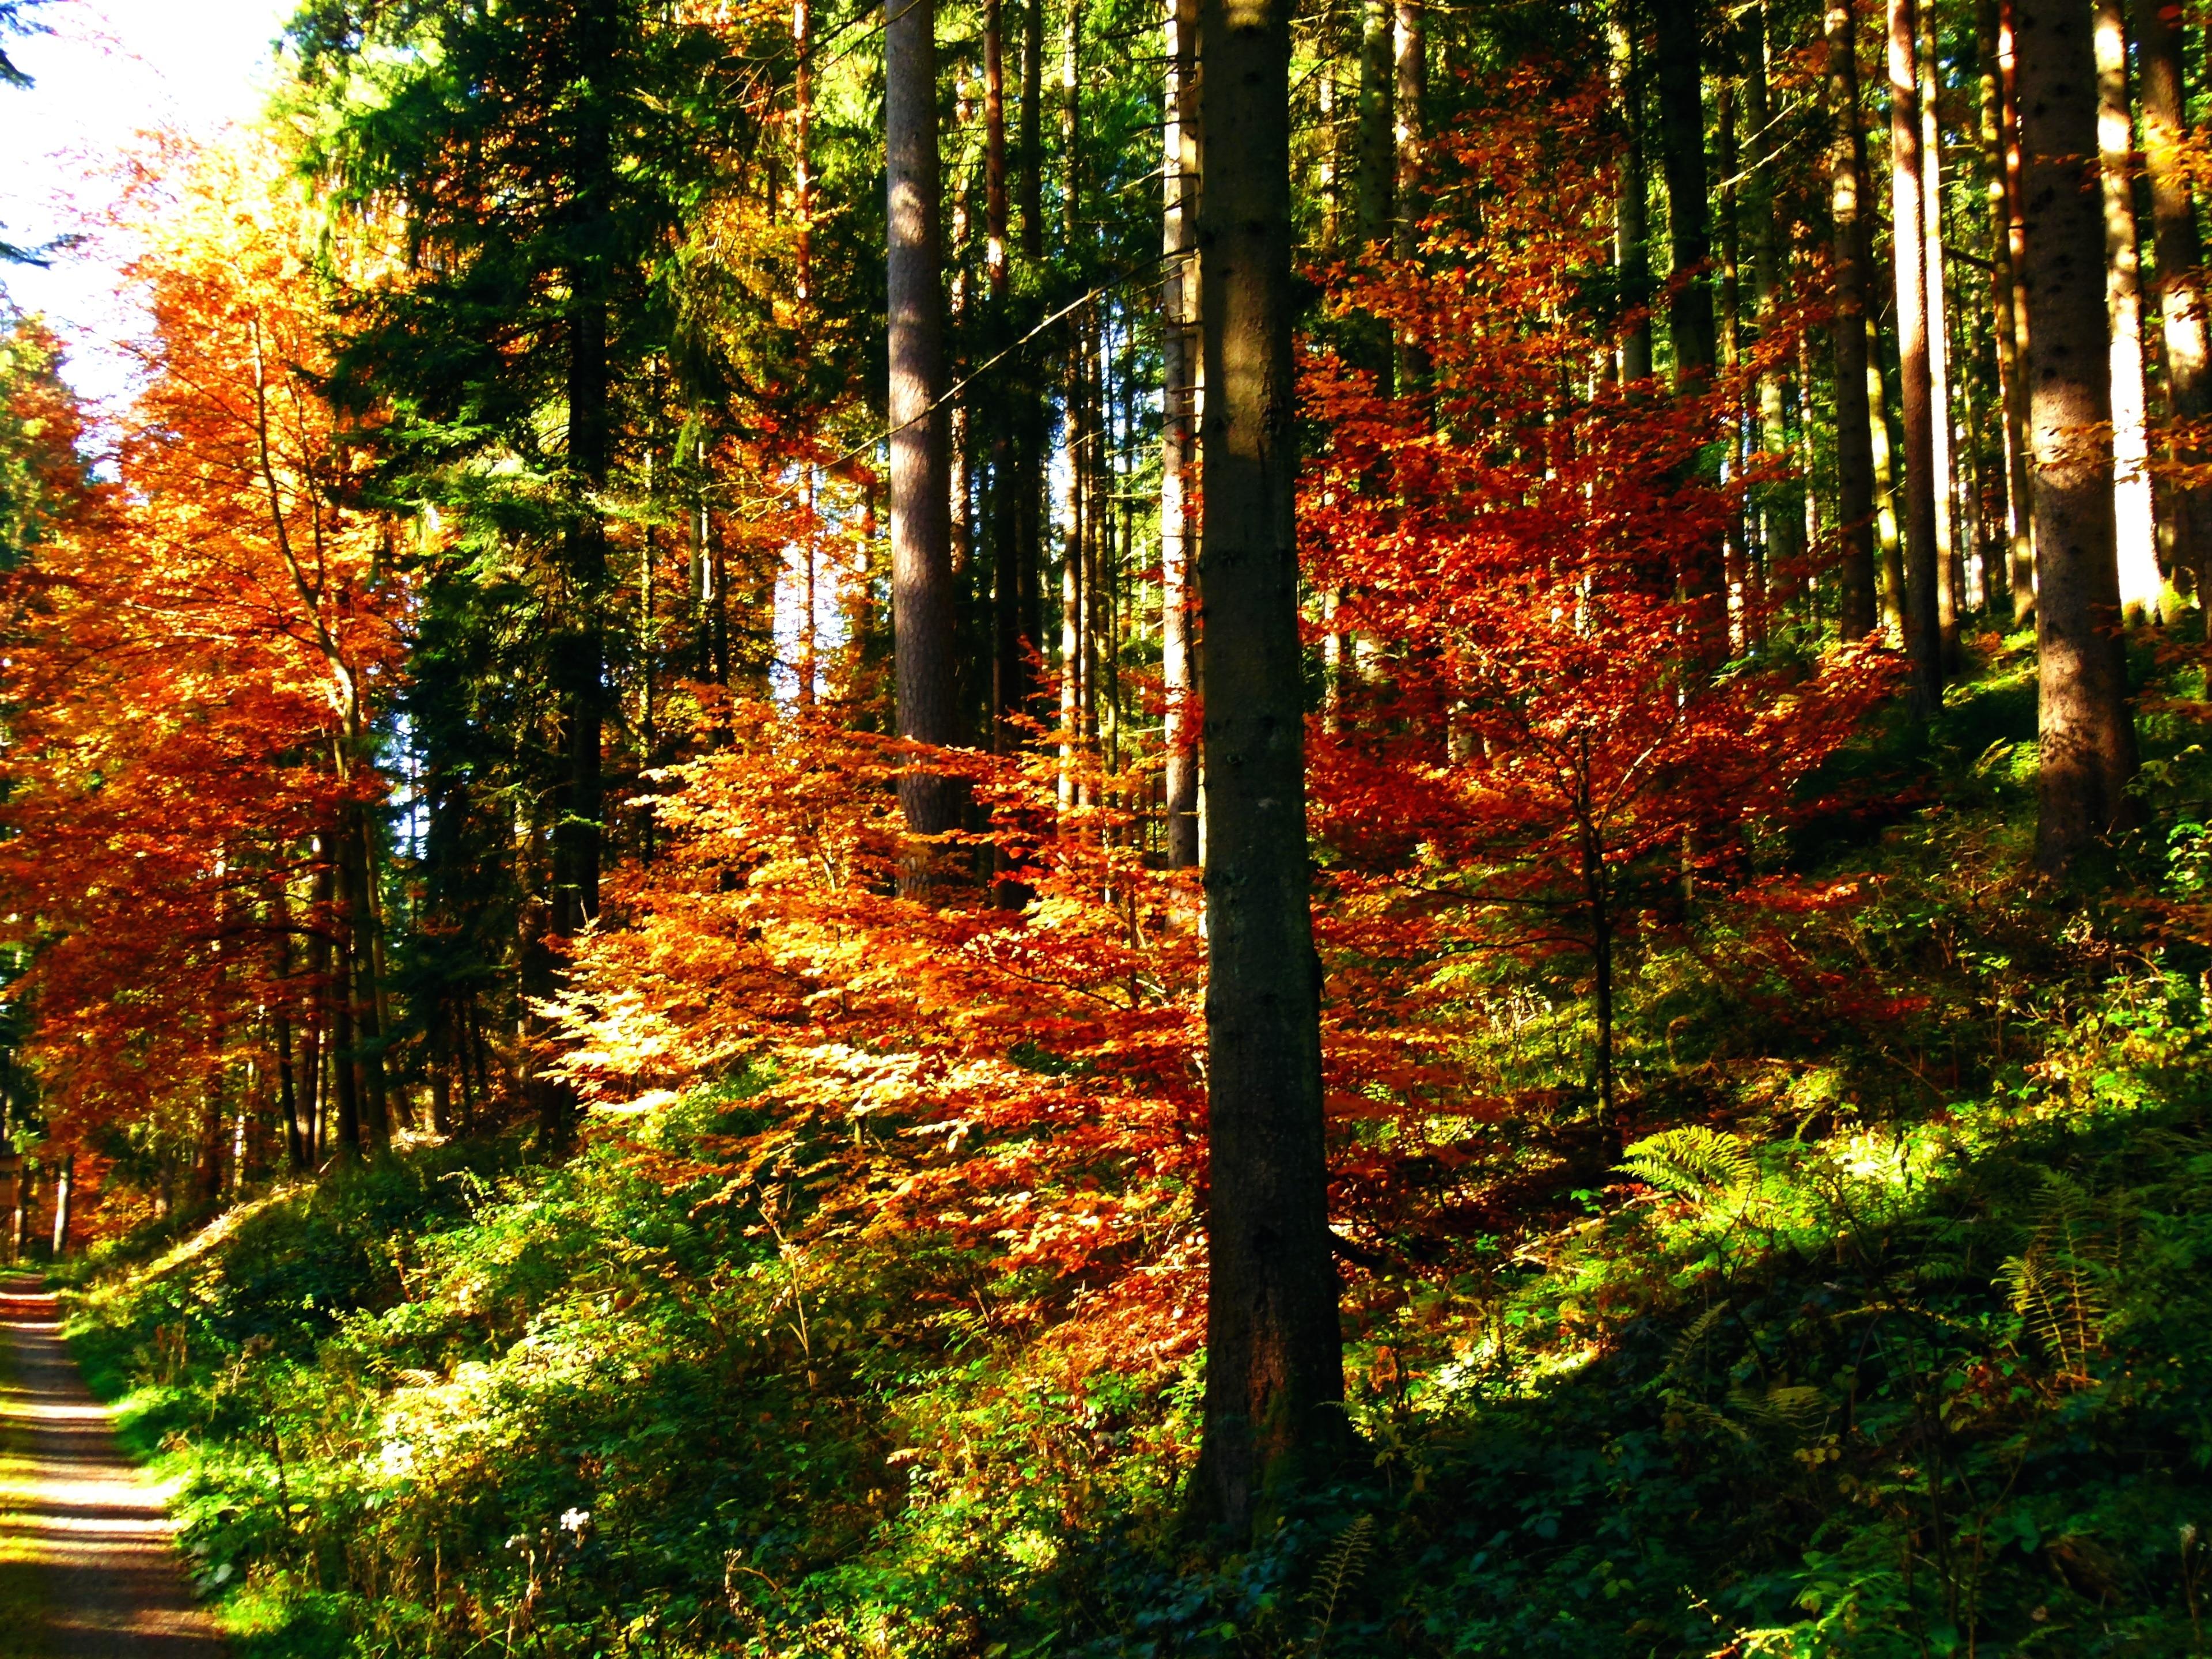 Baiersbronn, Baden-Württemberg, Germany